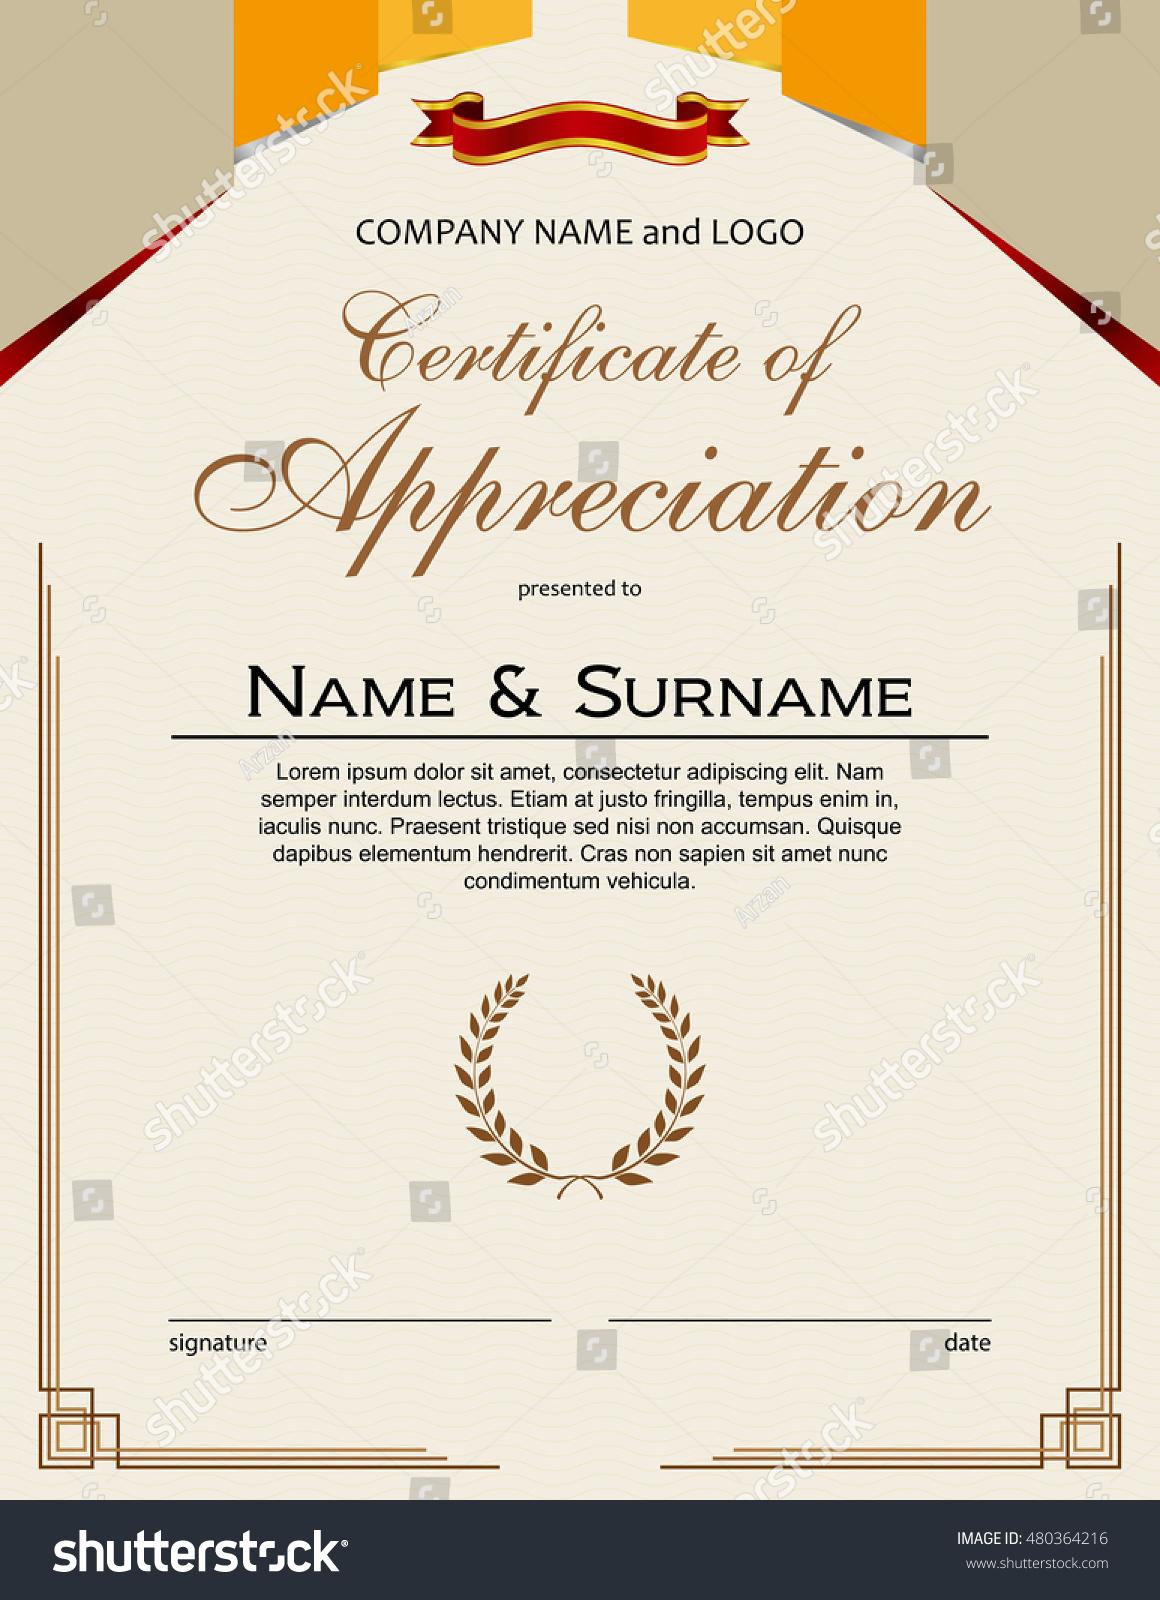 Certificate appreciation laurel wreaths ribbon portrait stock certificate of appreciation with laurel wreaths and ribbon portrait version yadclub Images